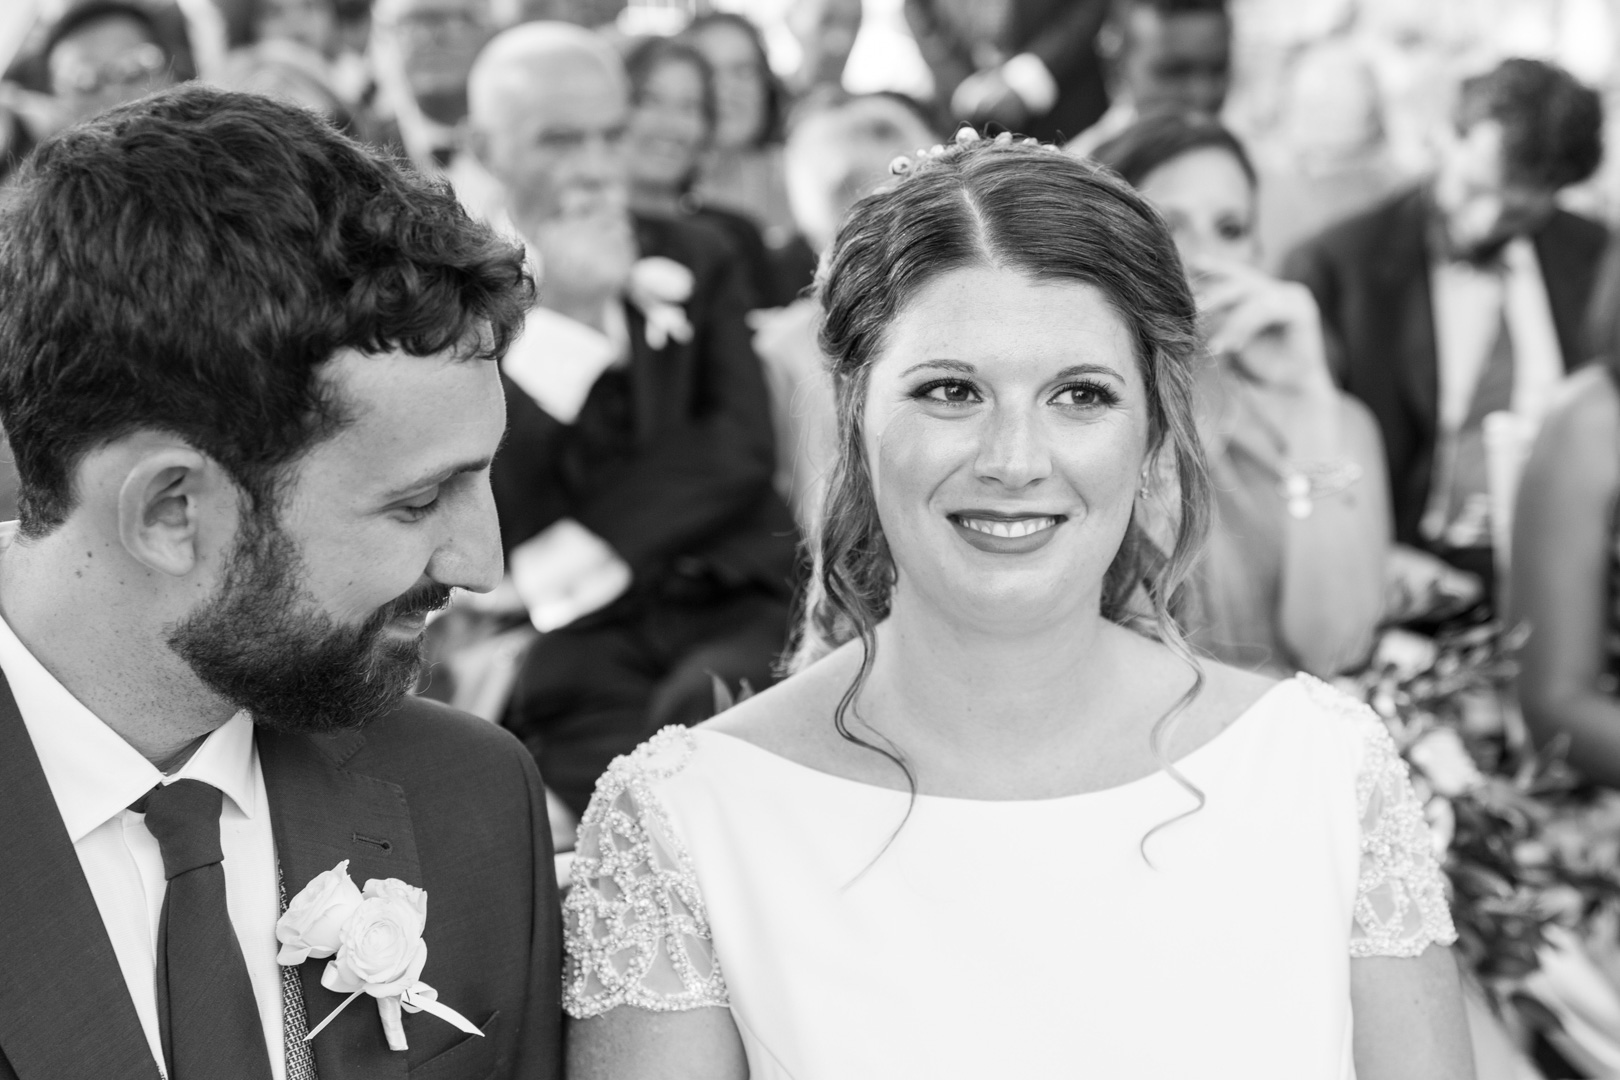 Andreas_Pinacci_Wedding_Photographer-25.